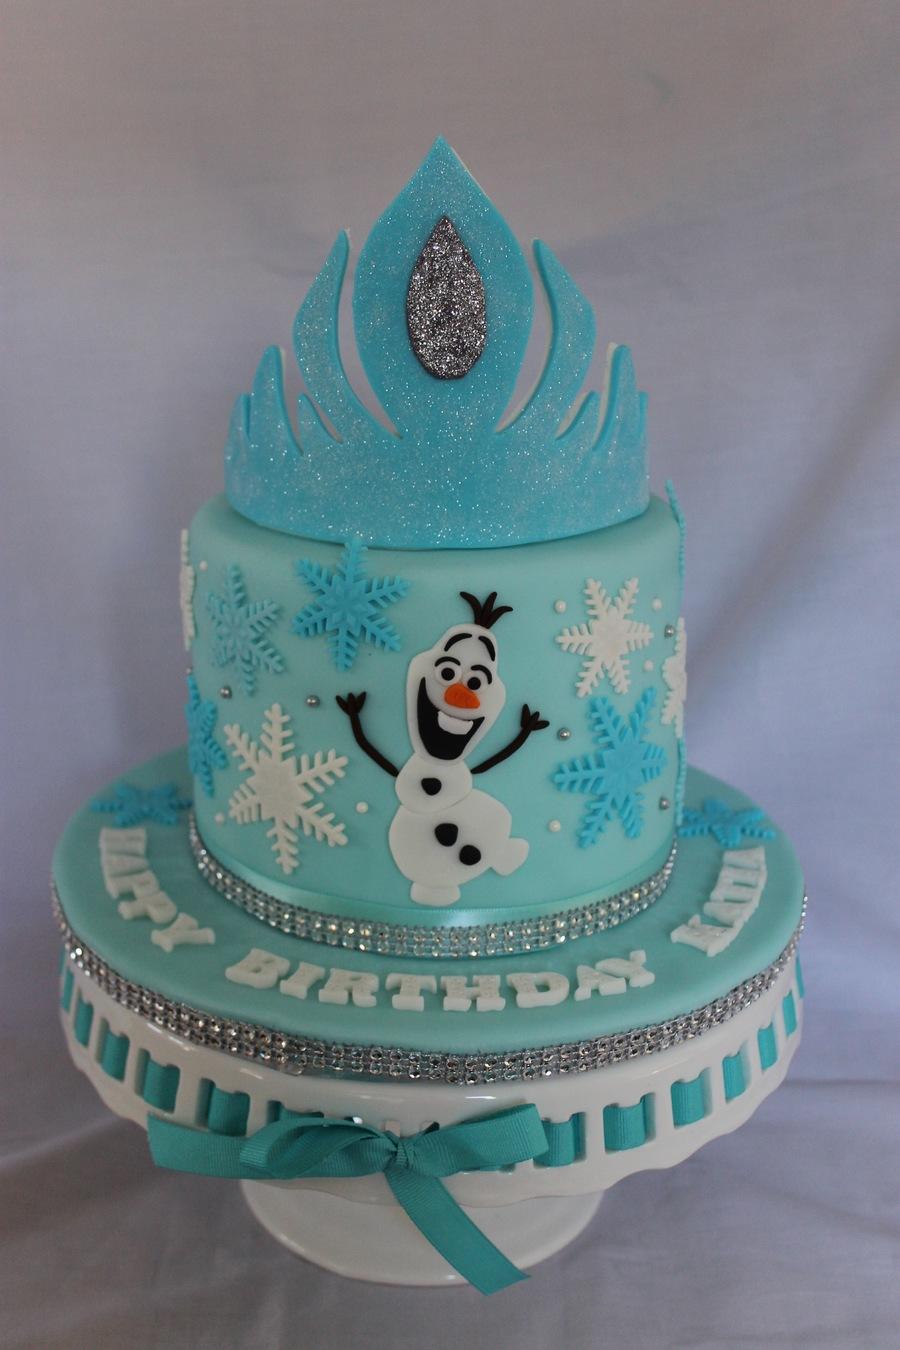 8EZ5wRRZRB-frozen-themed-birthday-cake_900.jpg